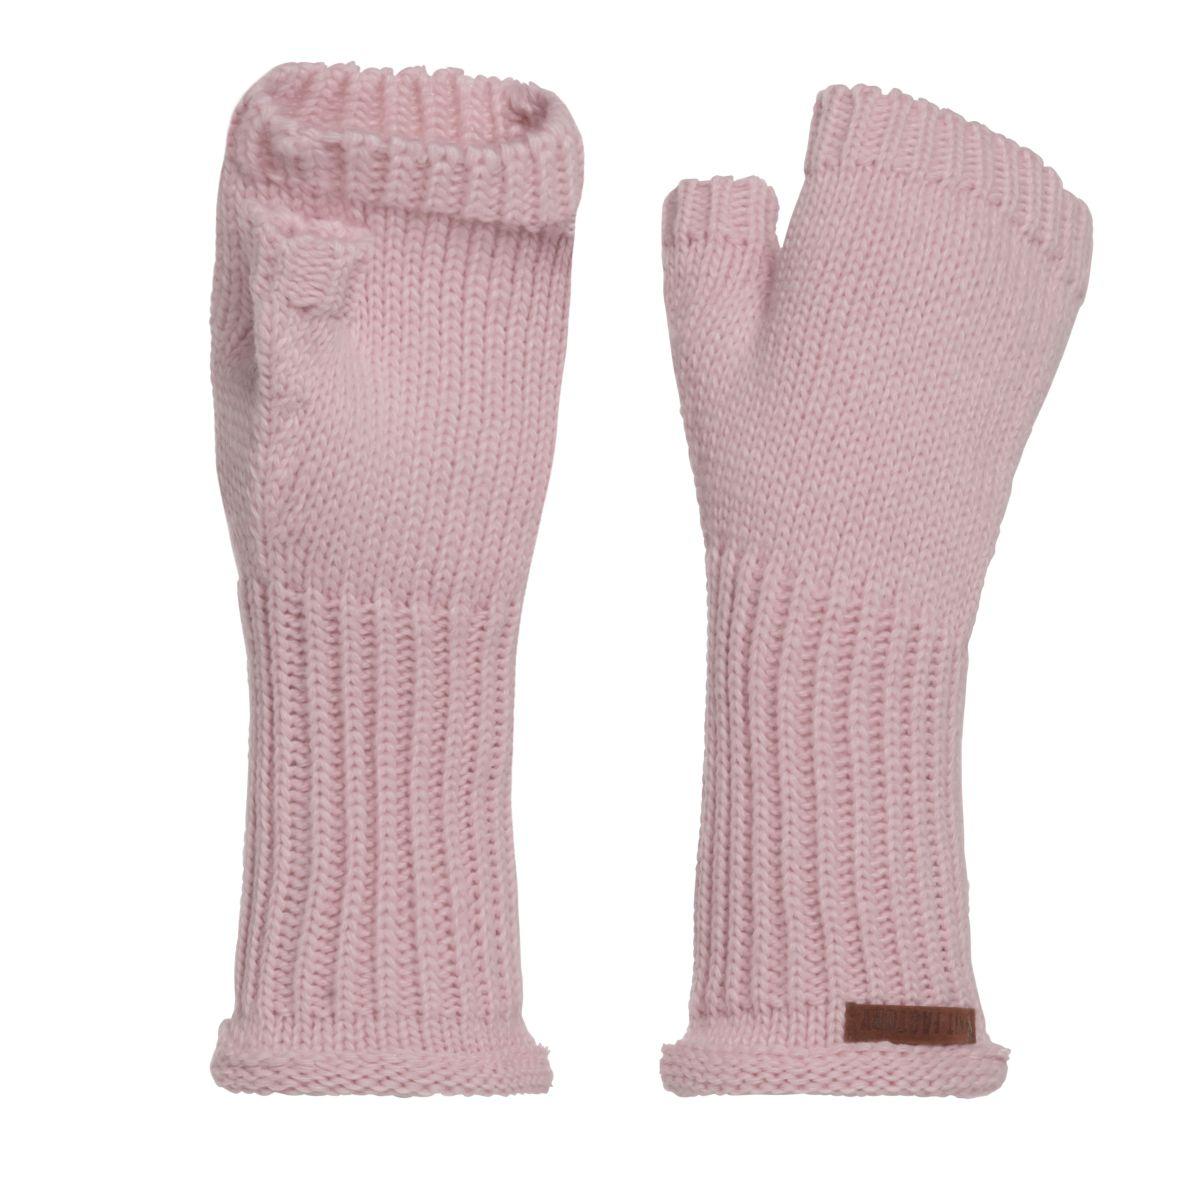 cleo gloves pink